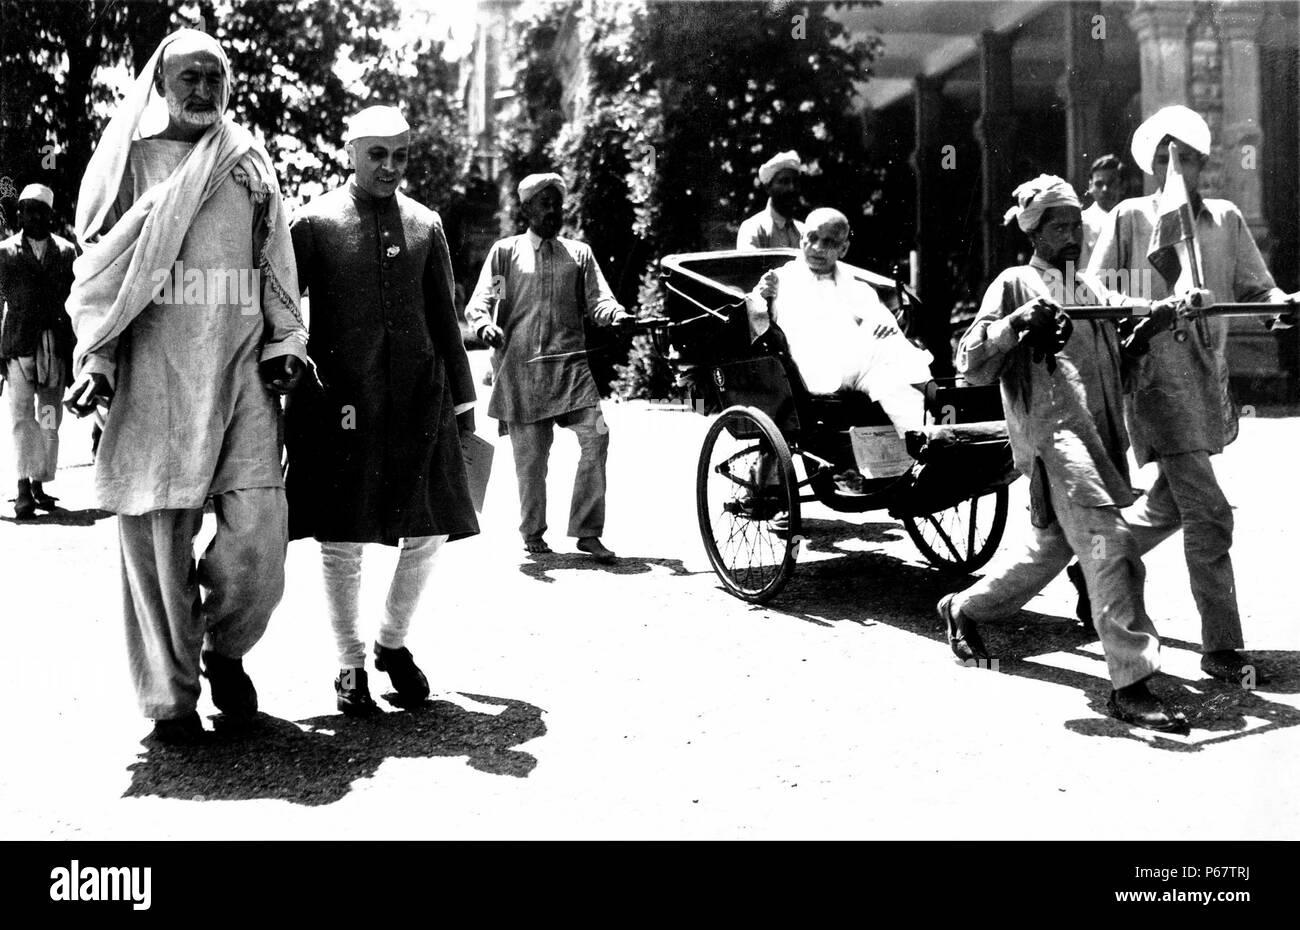 Khan Abdul Ghaffar Khan and Jawaharlal Nehru walk to a Congress meeting, while Sardar Patel is pulled alongside in a rickshaw. - Stock Image